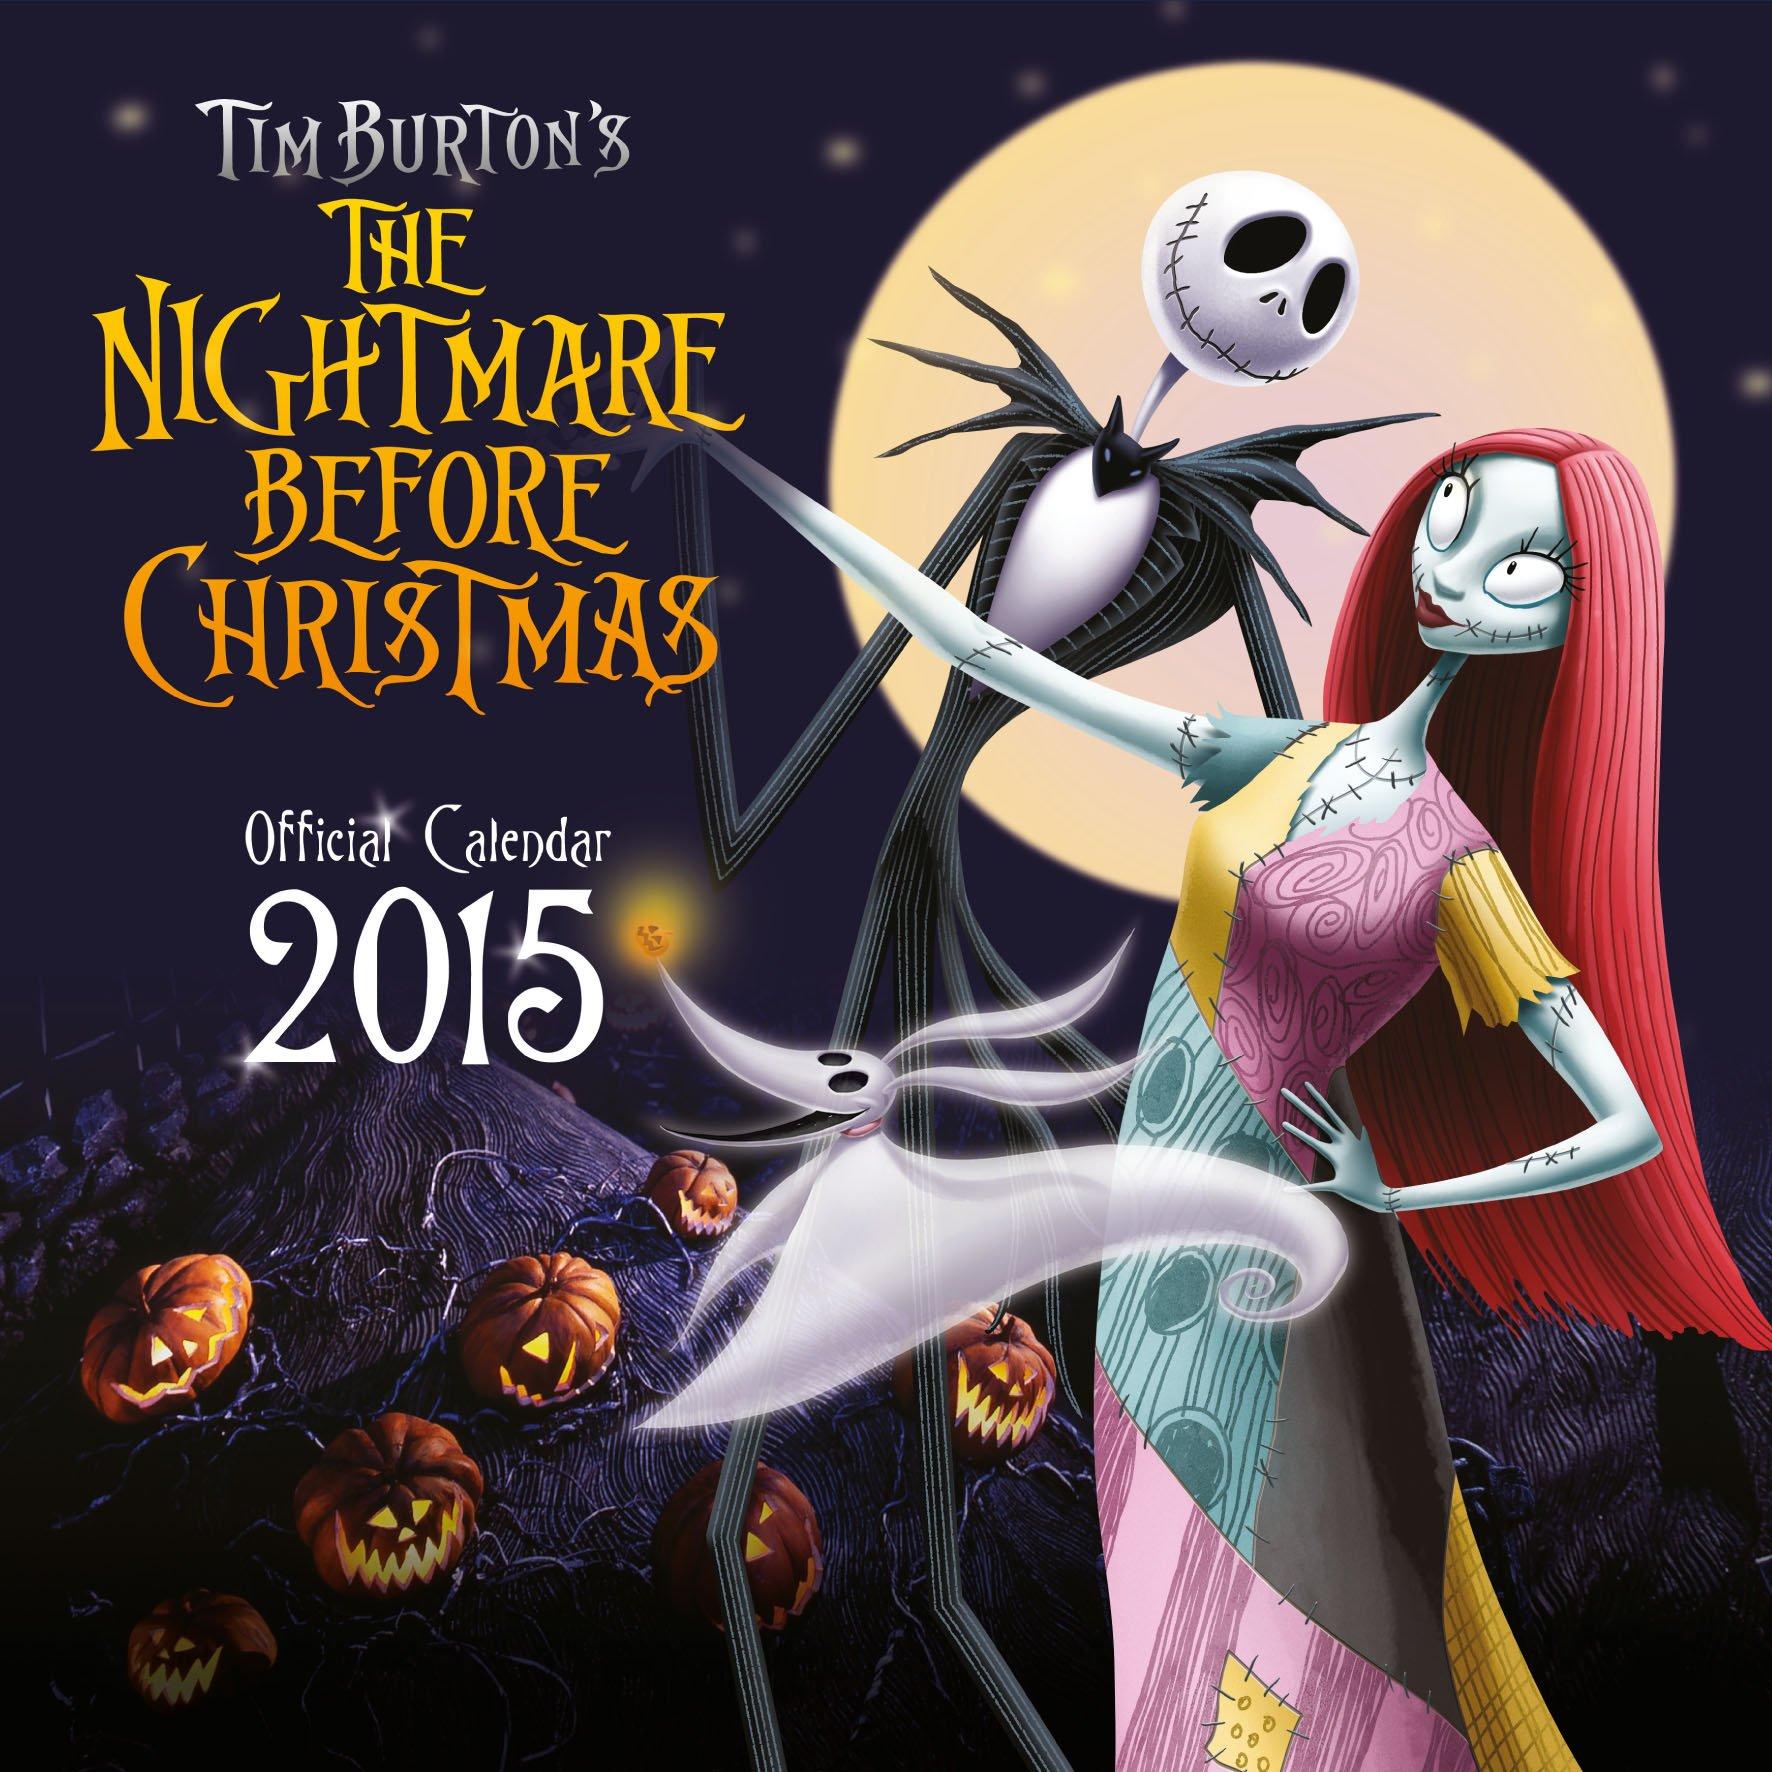 Official Nightmare Before Christmas Calendar 2015: 9781780546056 ...